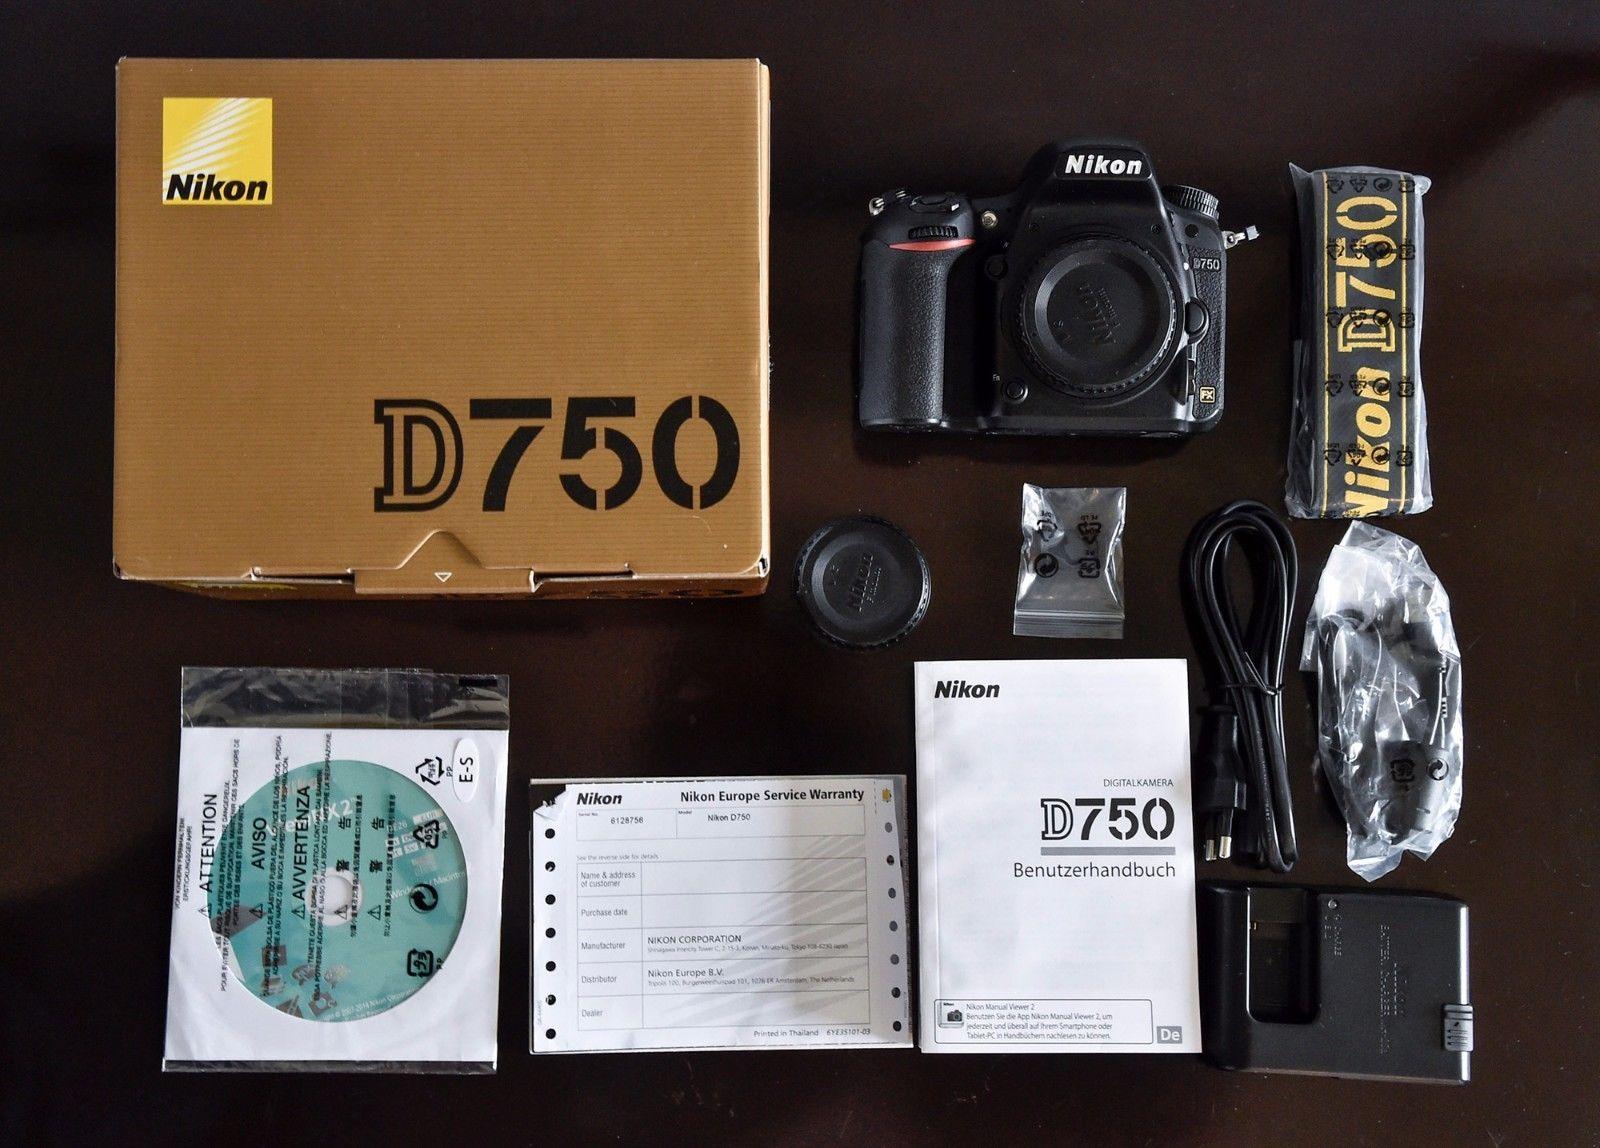 Nikon D750  FX 24,3 MP Vollformatsensor | Gehäuse komplett in OVP mit #1109 Ausl